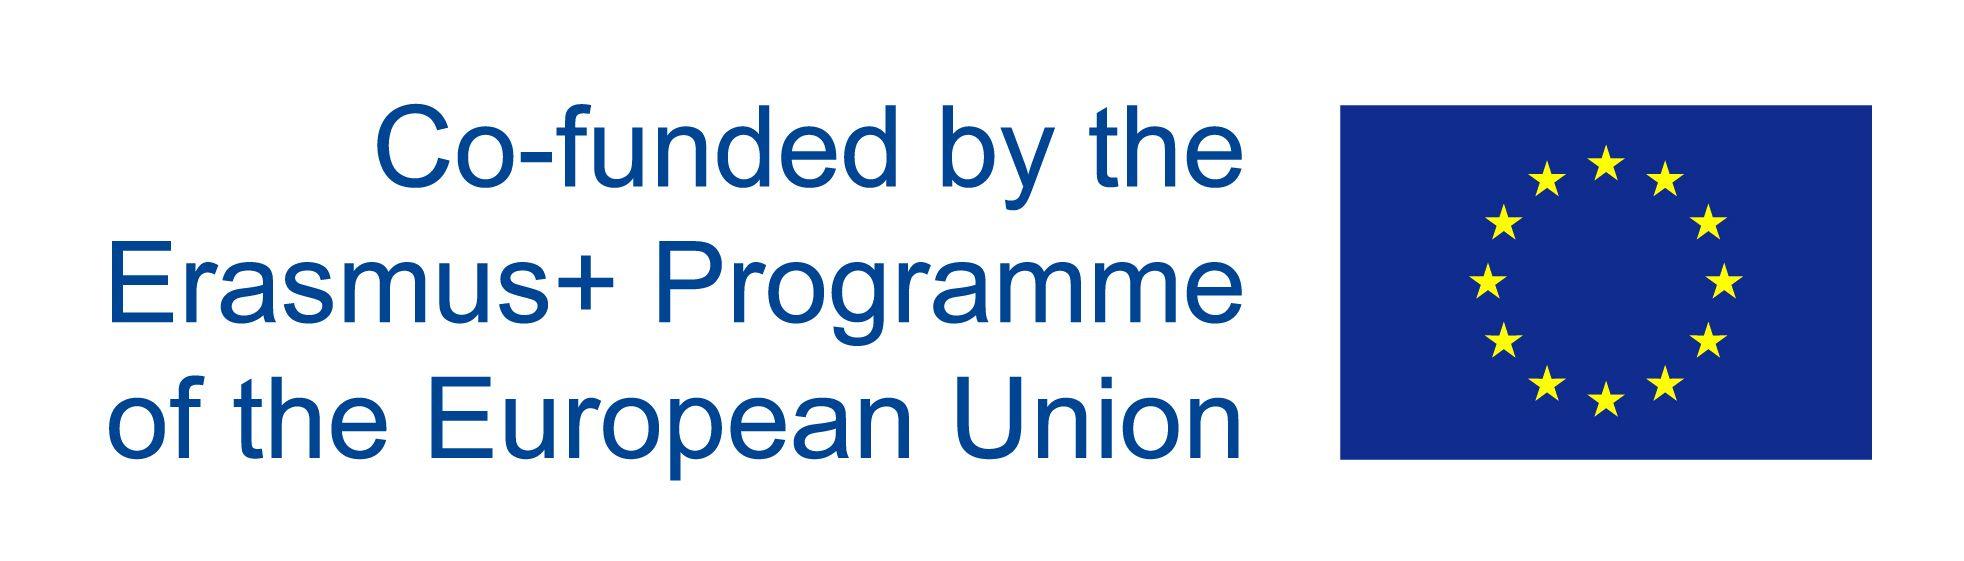 eu flag co funded erasmusplus